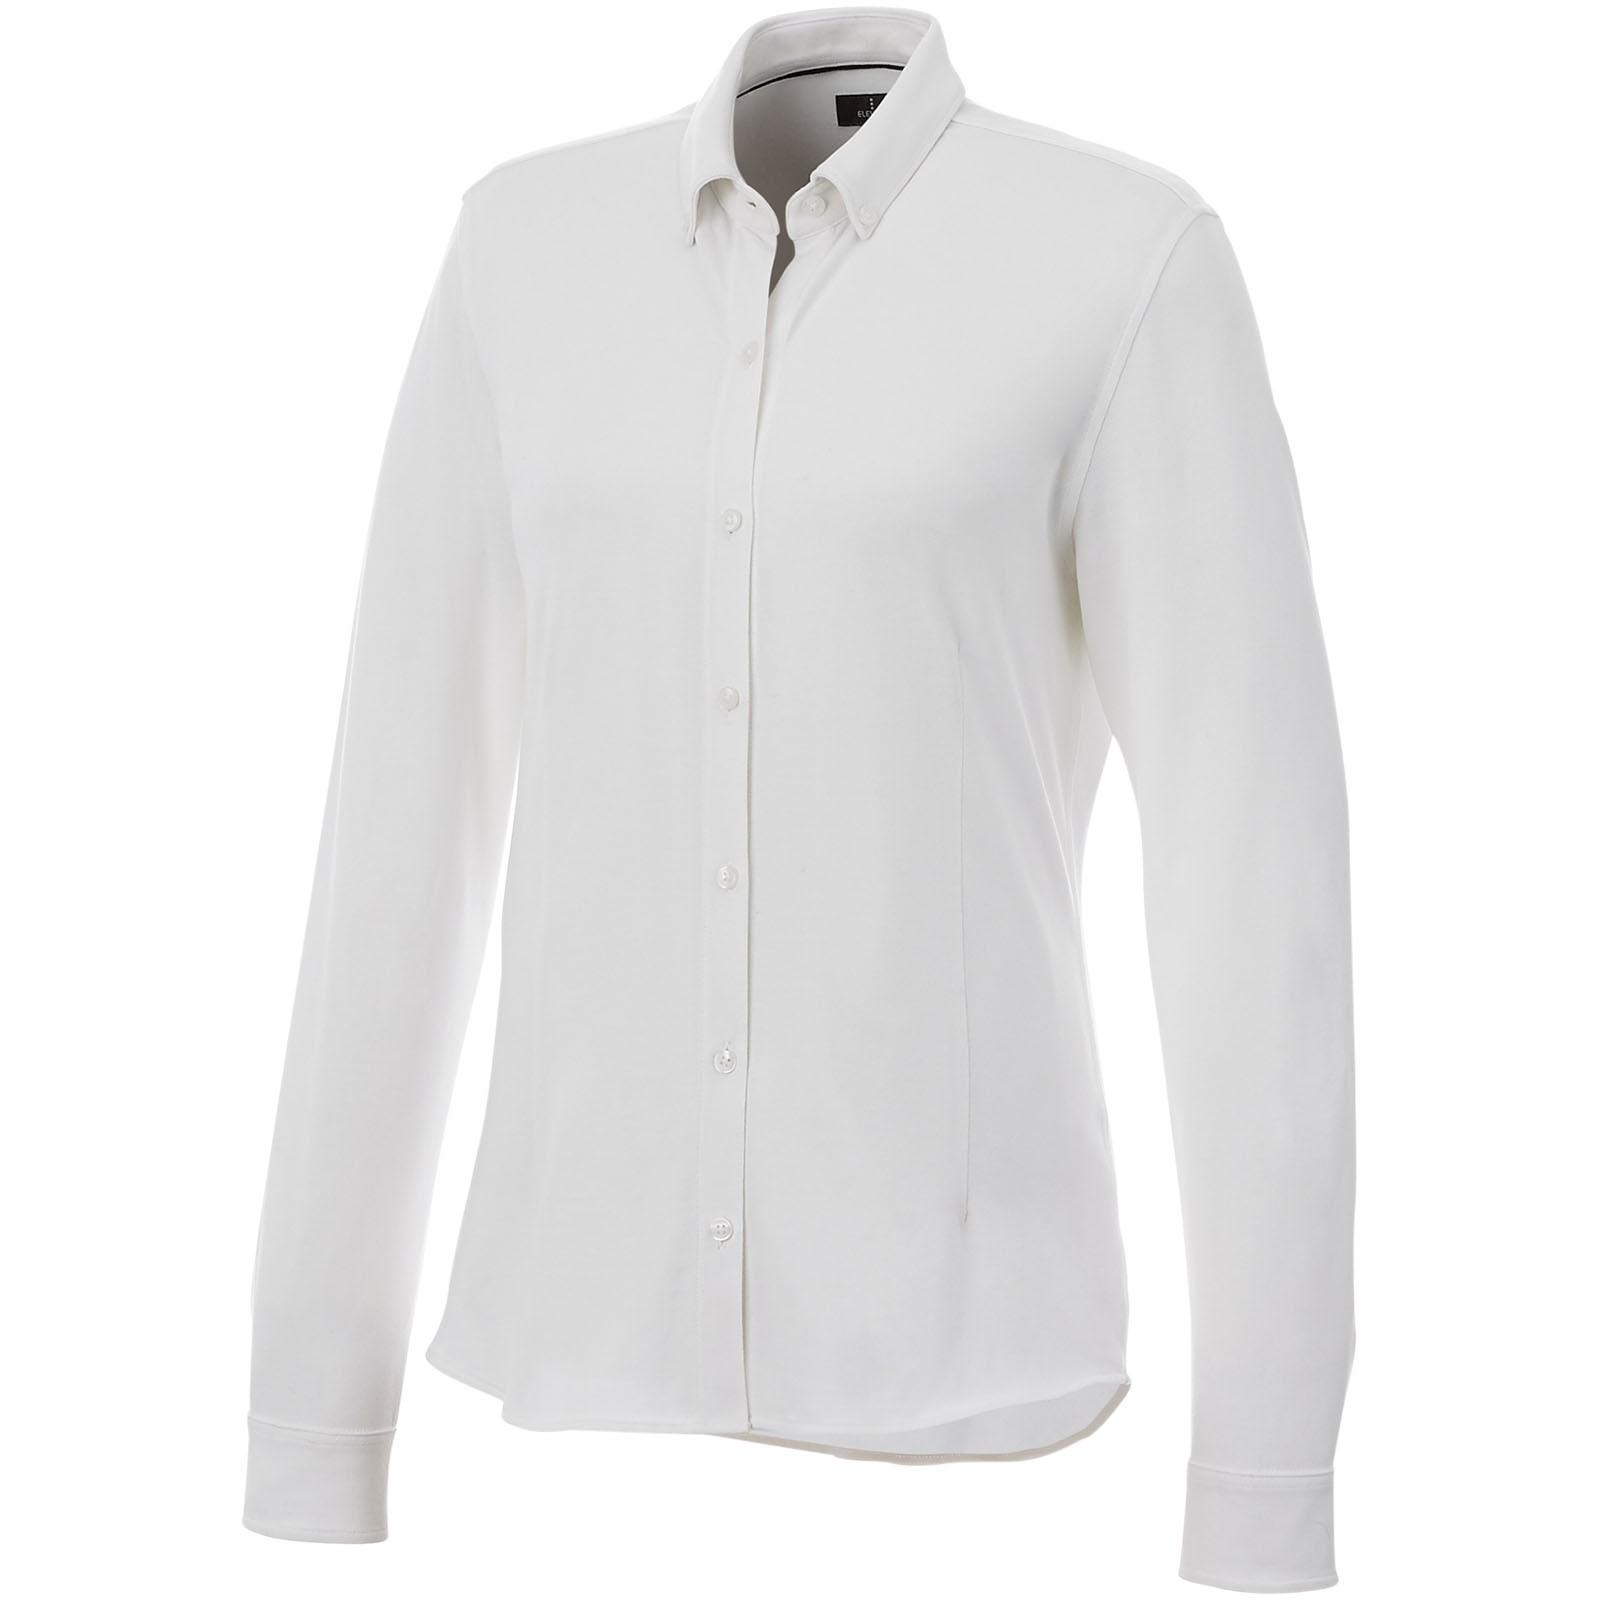 Bigelow long sleeve women's pique shirt - White / XXL